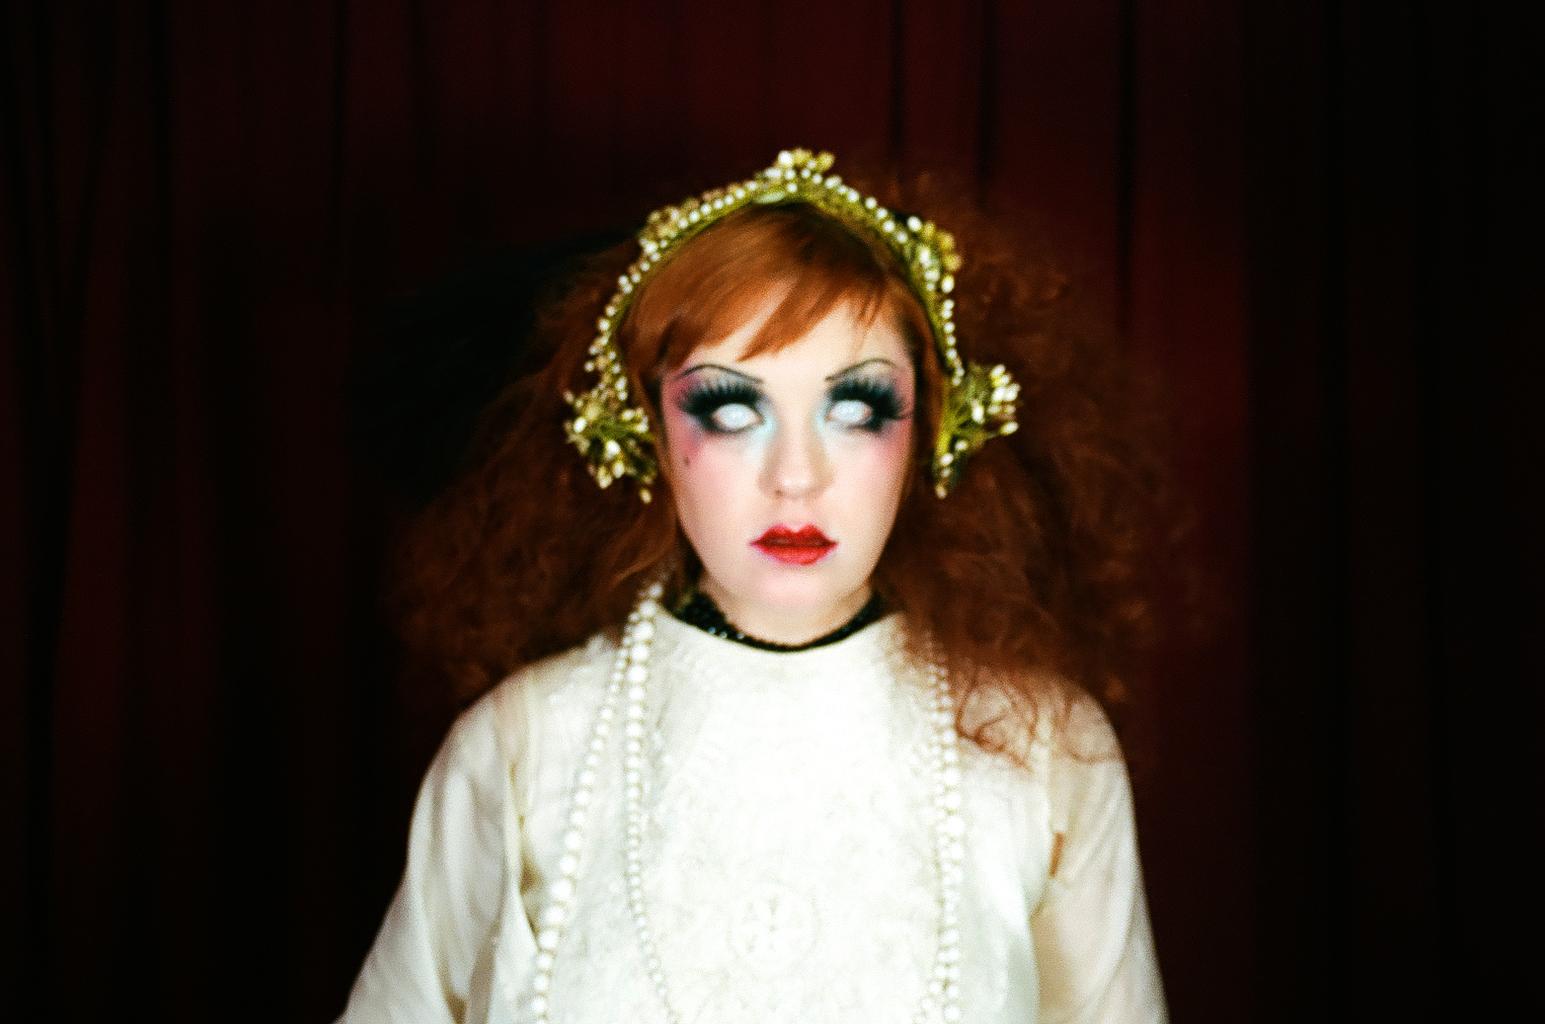 Analog photograph of Lada Redstar, Backstage at Le Pustra's Kabarett der Namenlosen, 2017